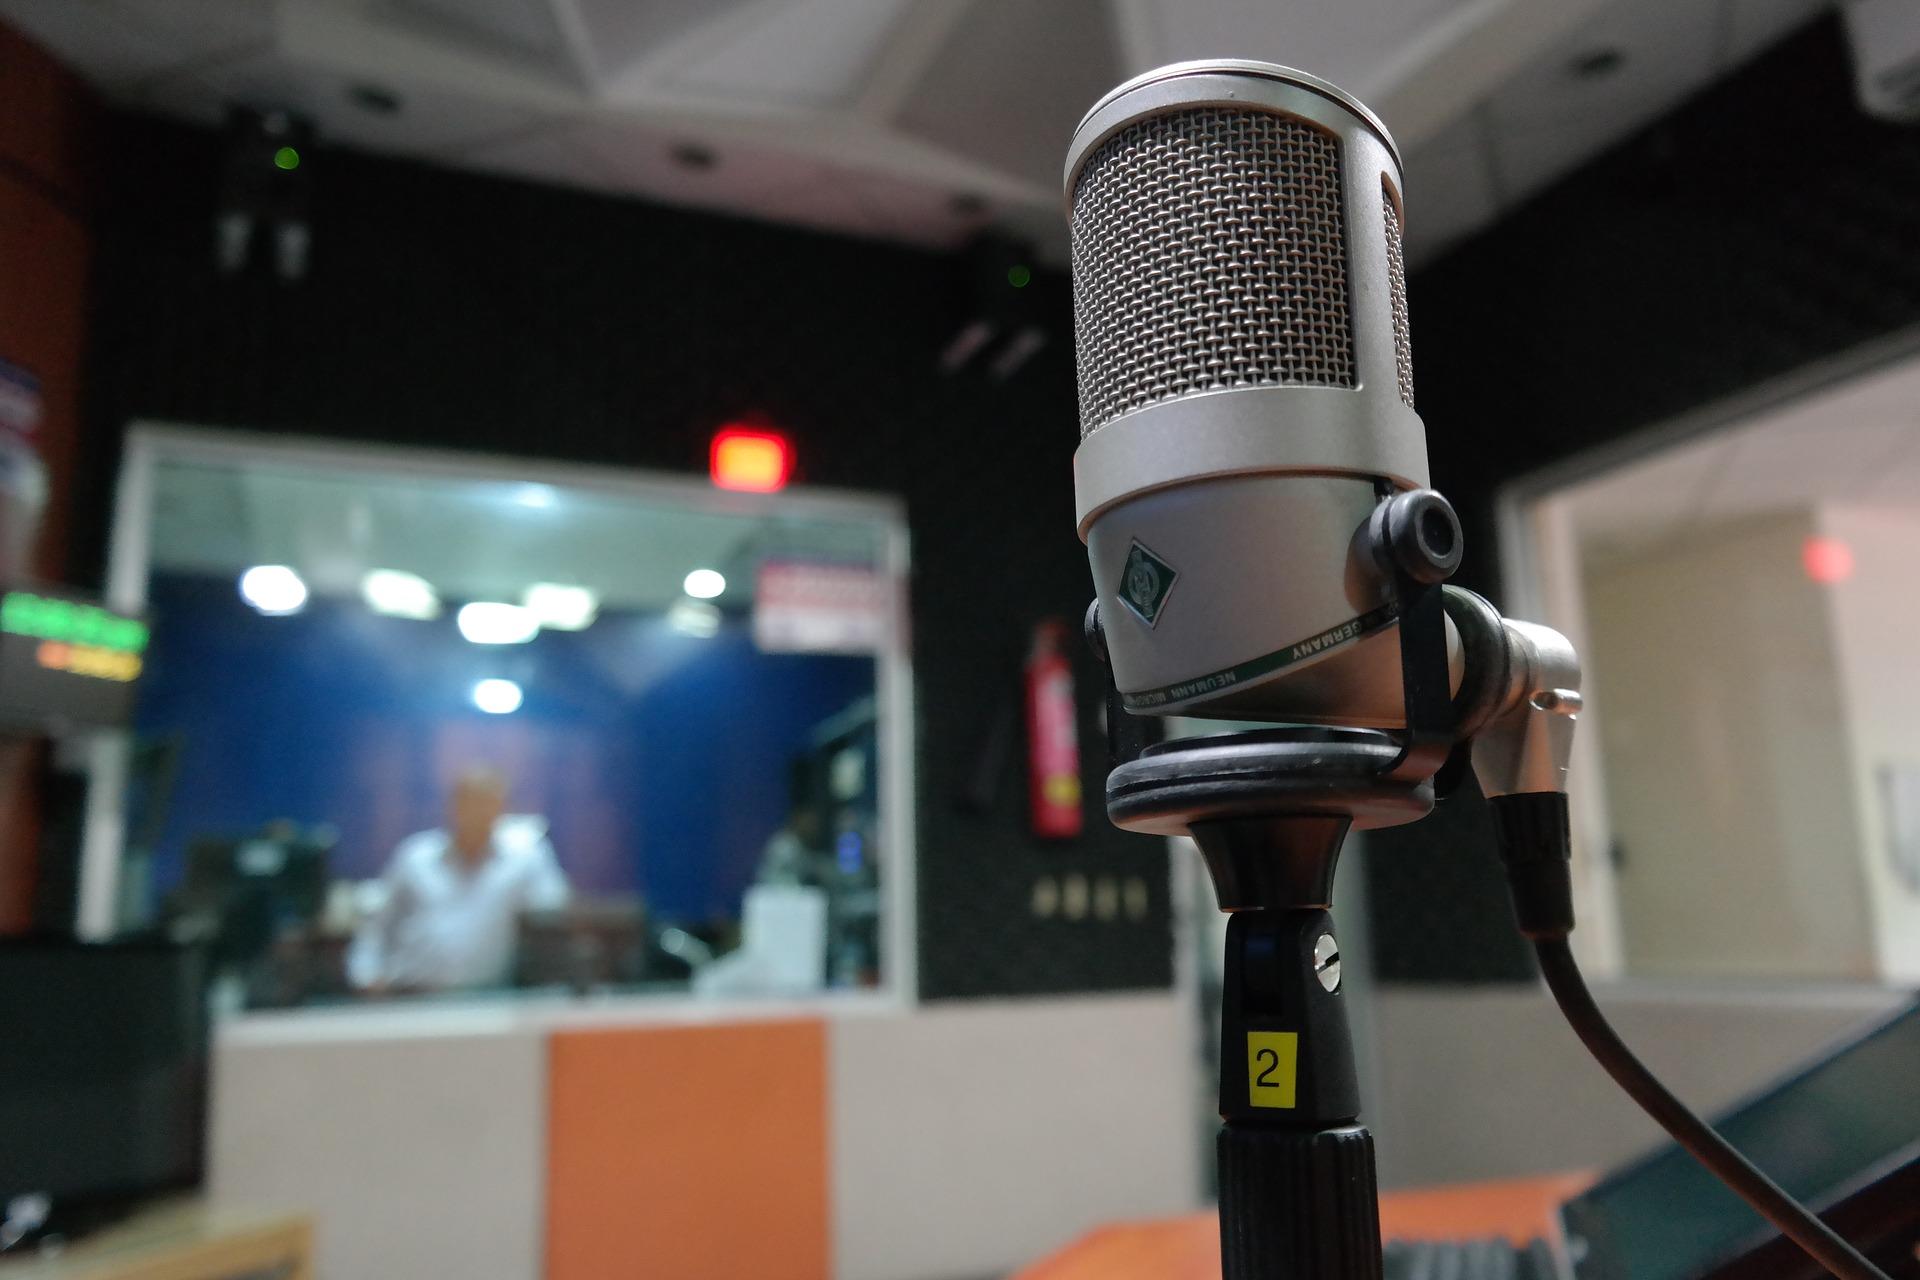 micrófono-1562354_1920